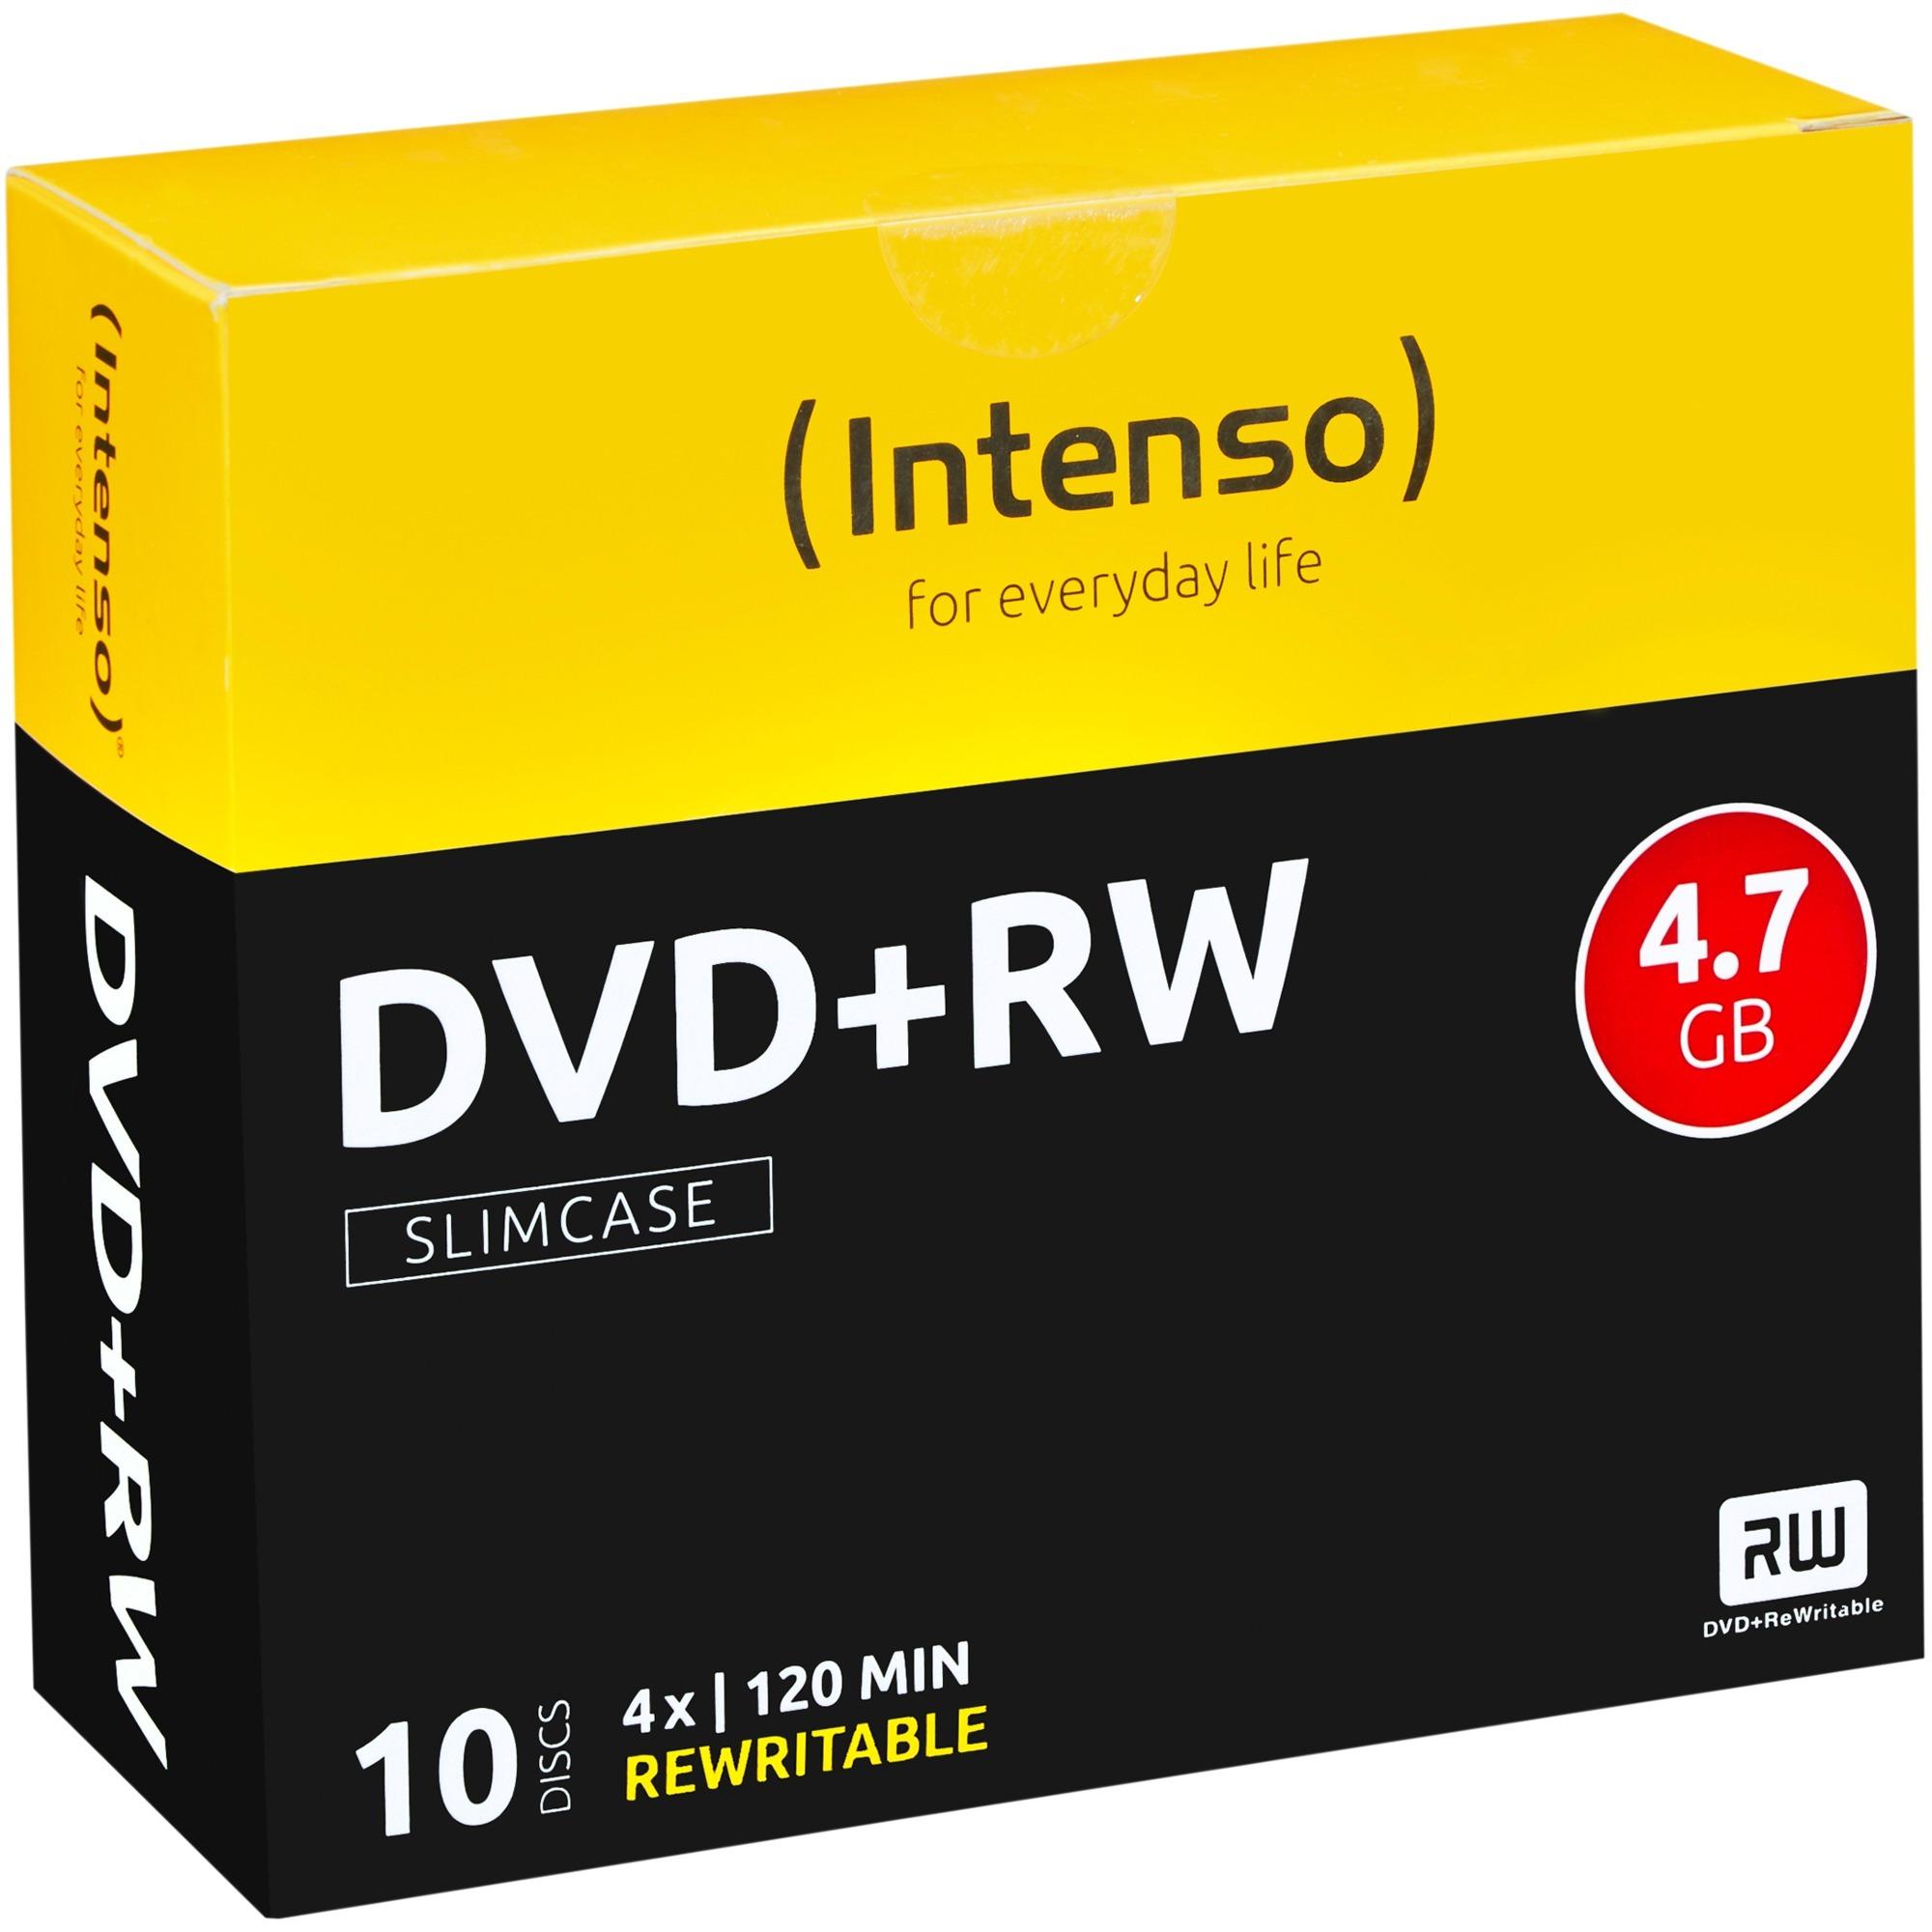 DVD+RW 4.7GB, 4x 4.7Go DVD+RW 10pièce(s), Support vierge DVD